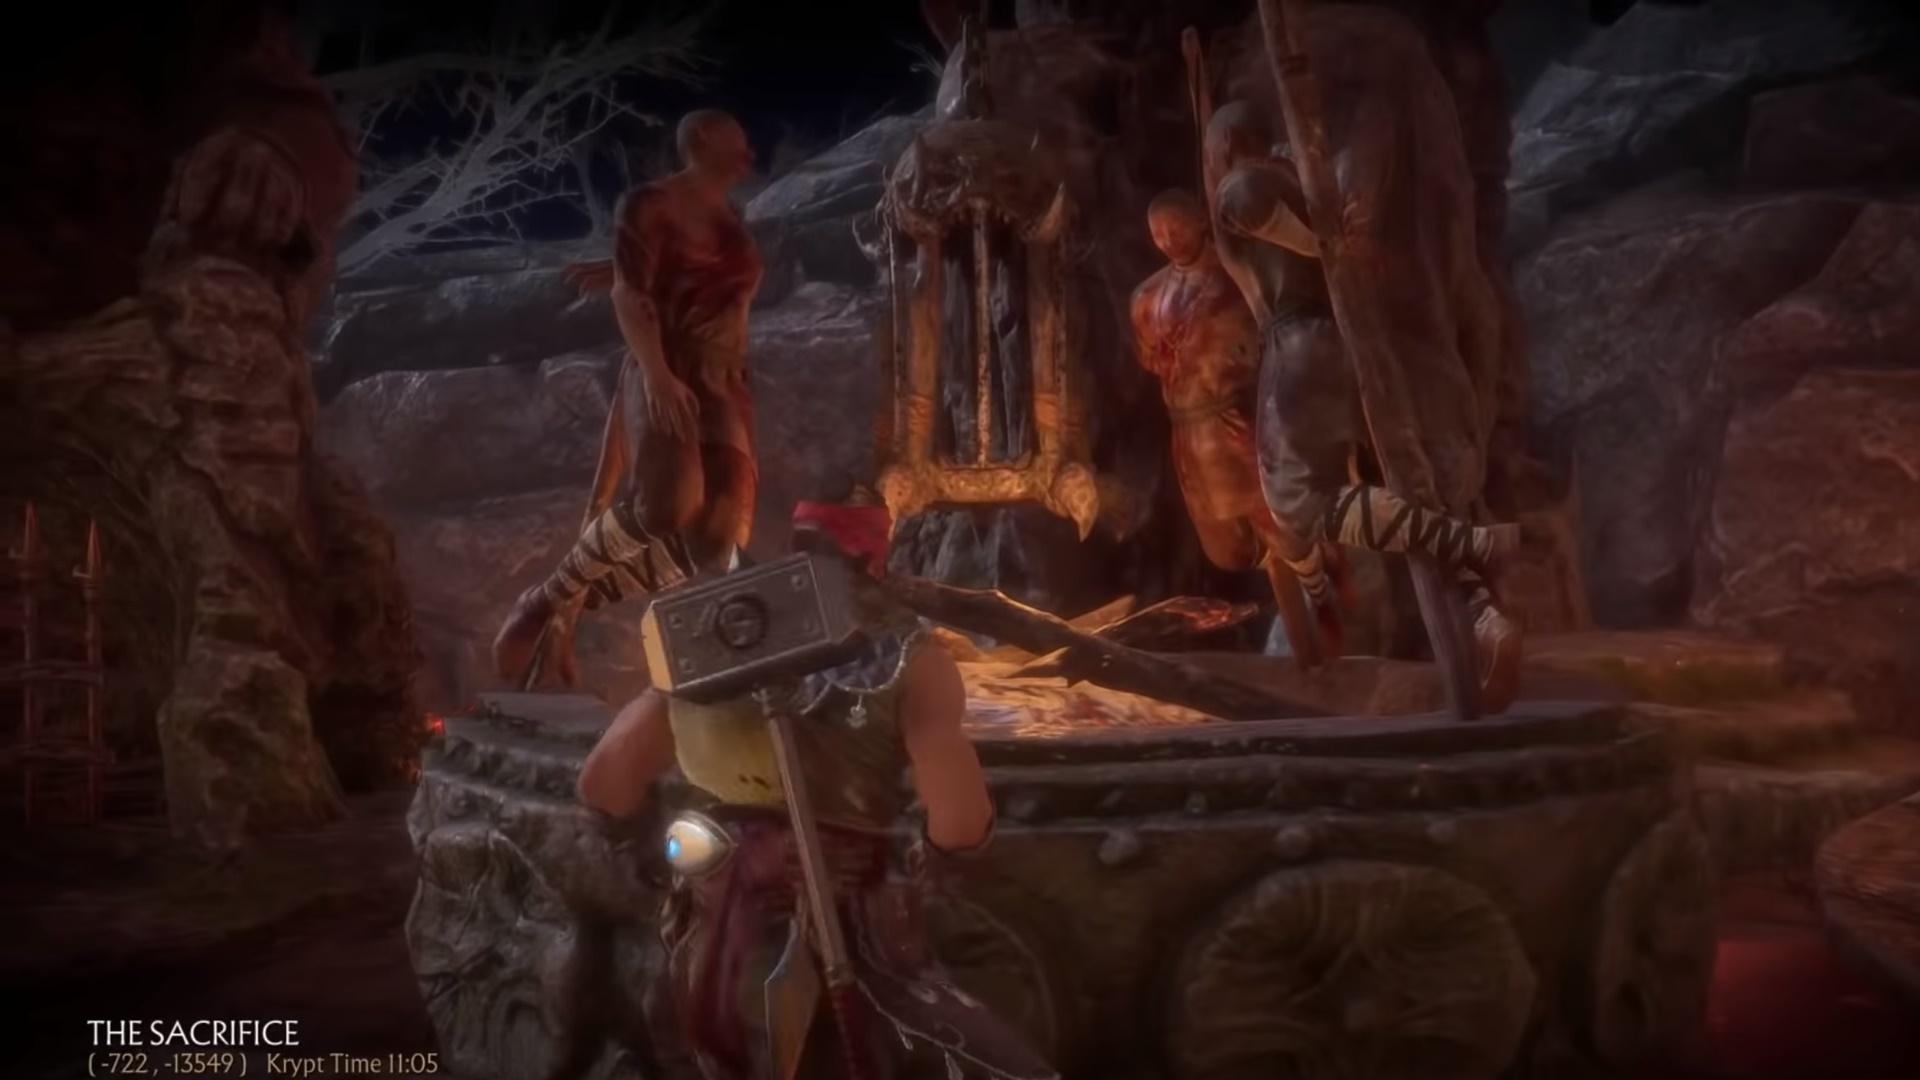 Mortal Kombat 11 Krypt walkthrough: key items, chests, and